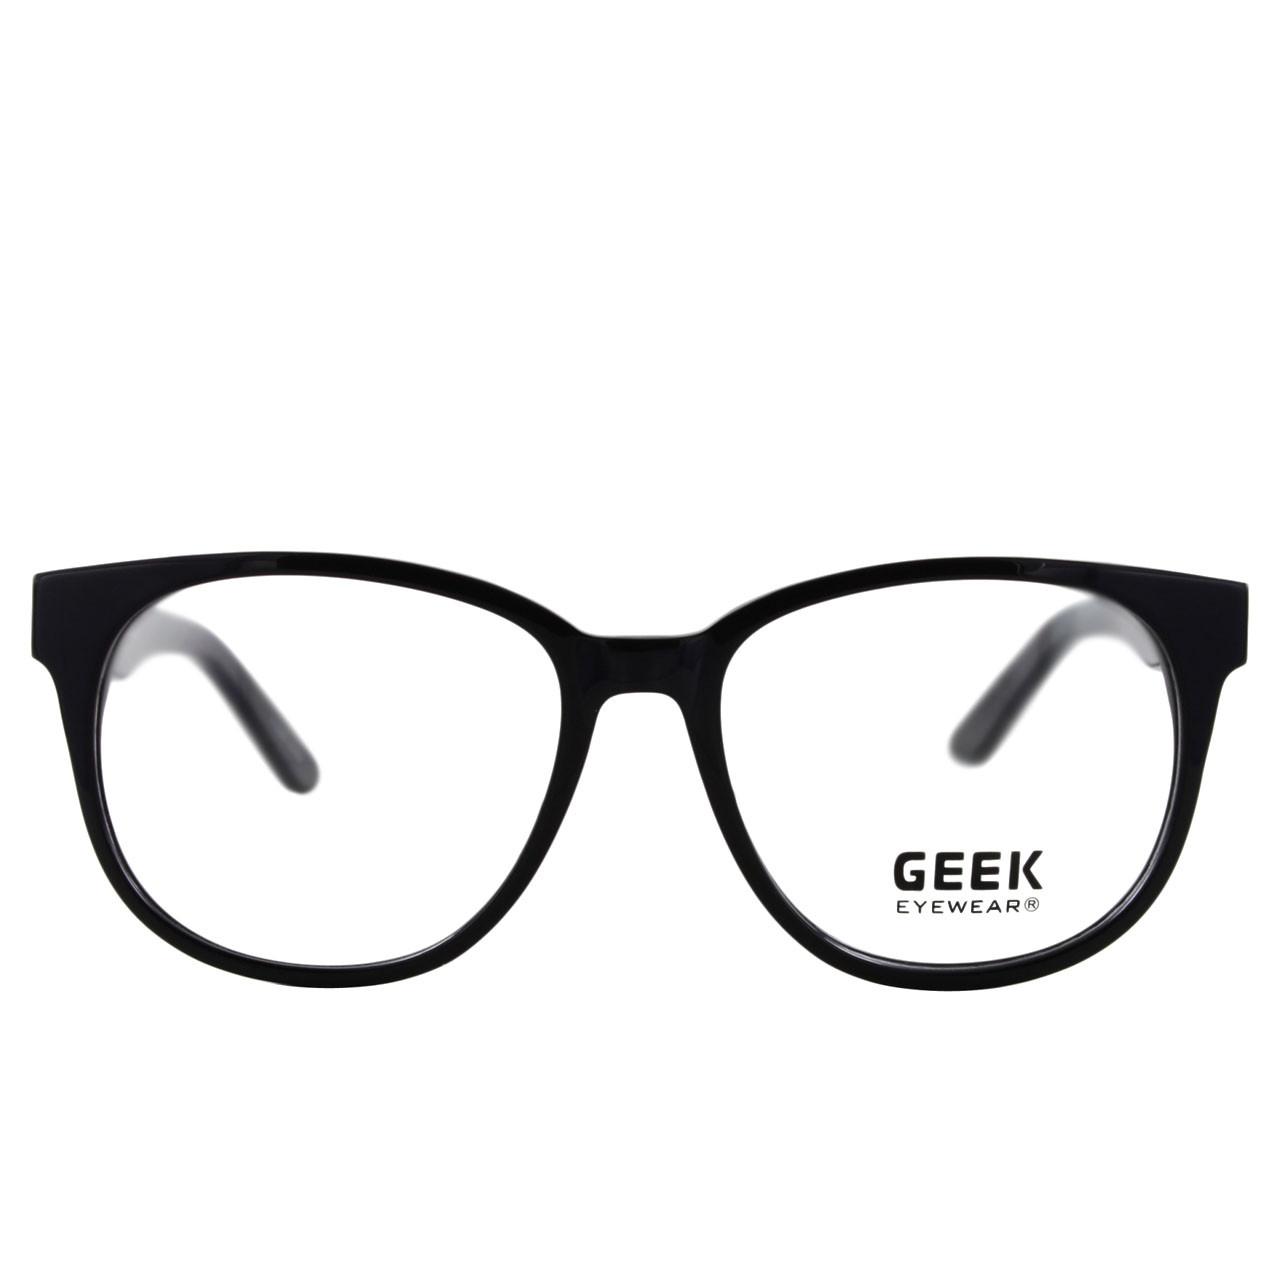 GEEK Eyewear Style Trenta